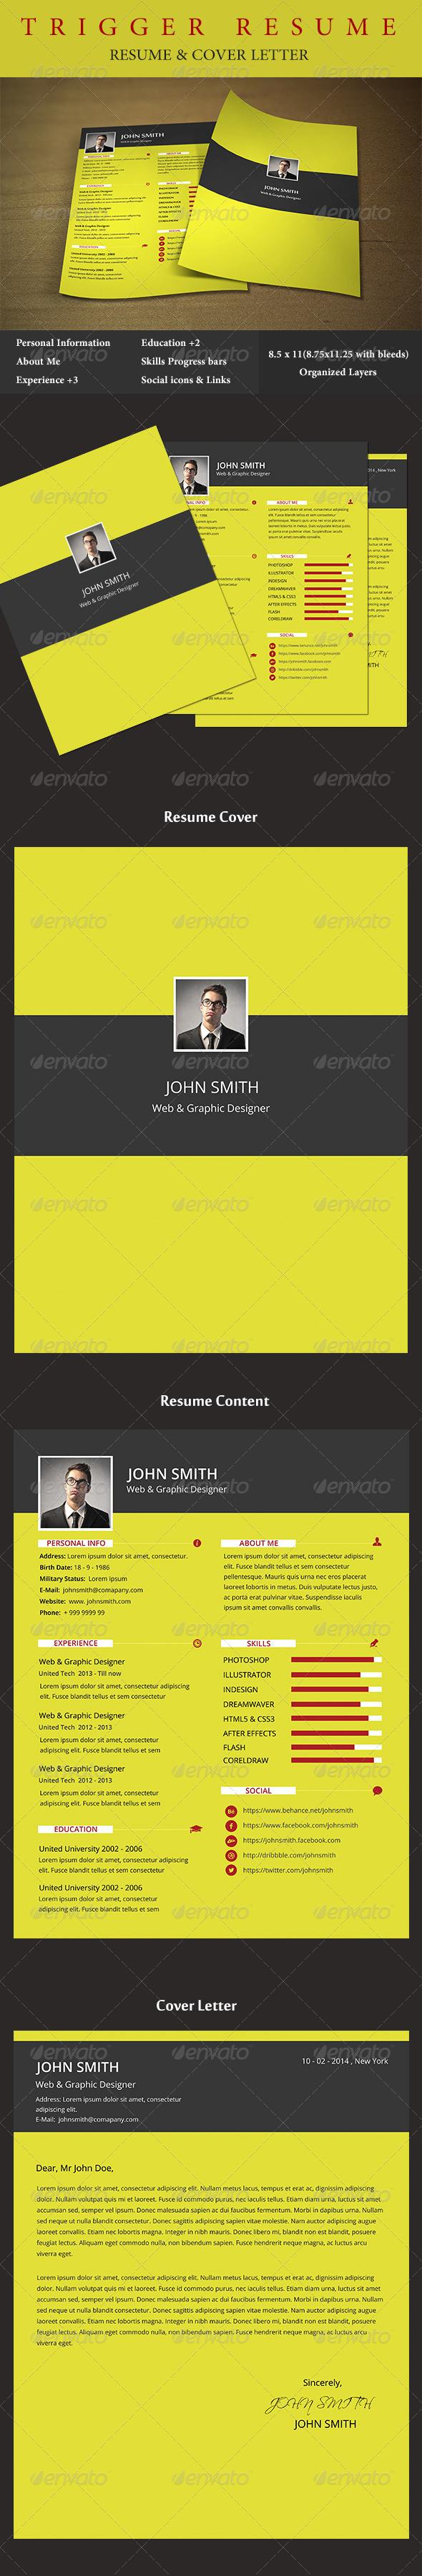 GraphicRiver Trigger Resume 6896790